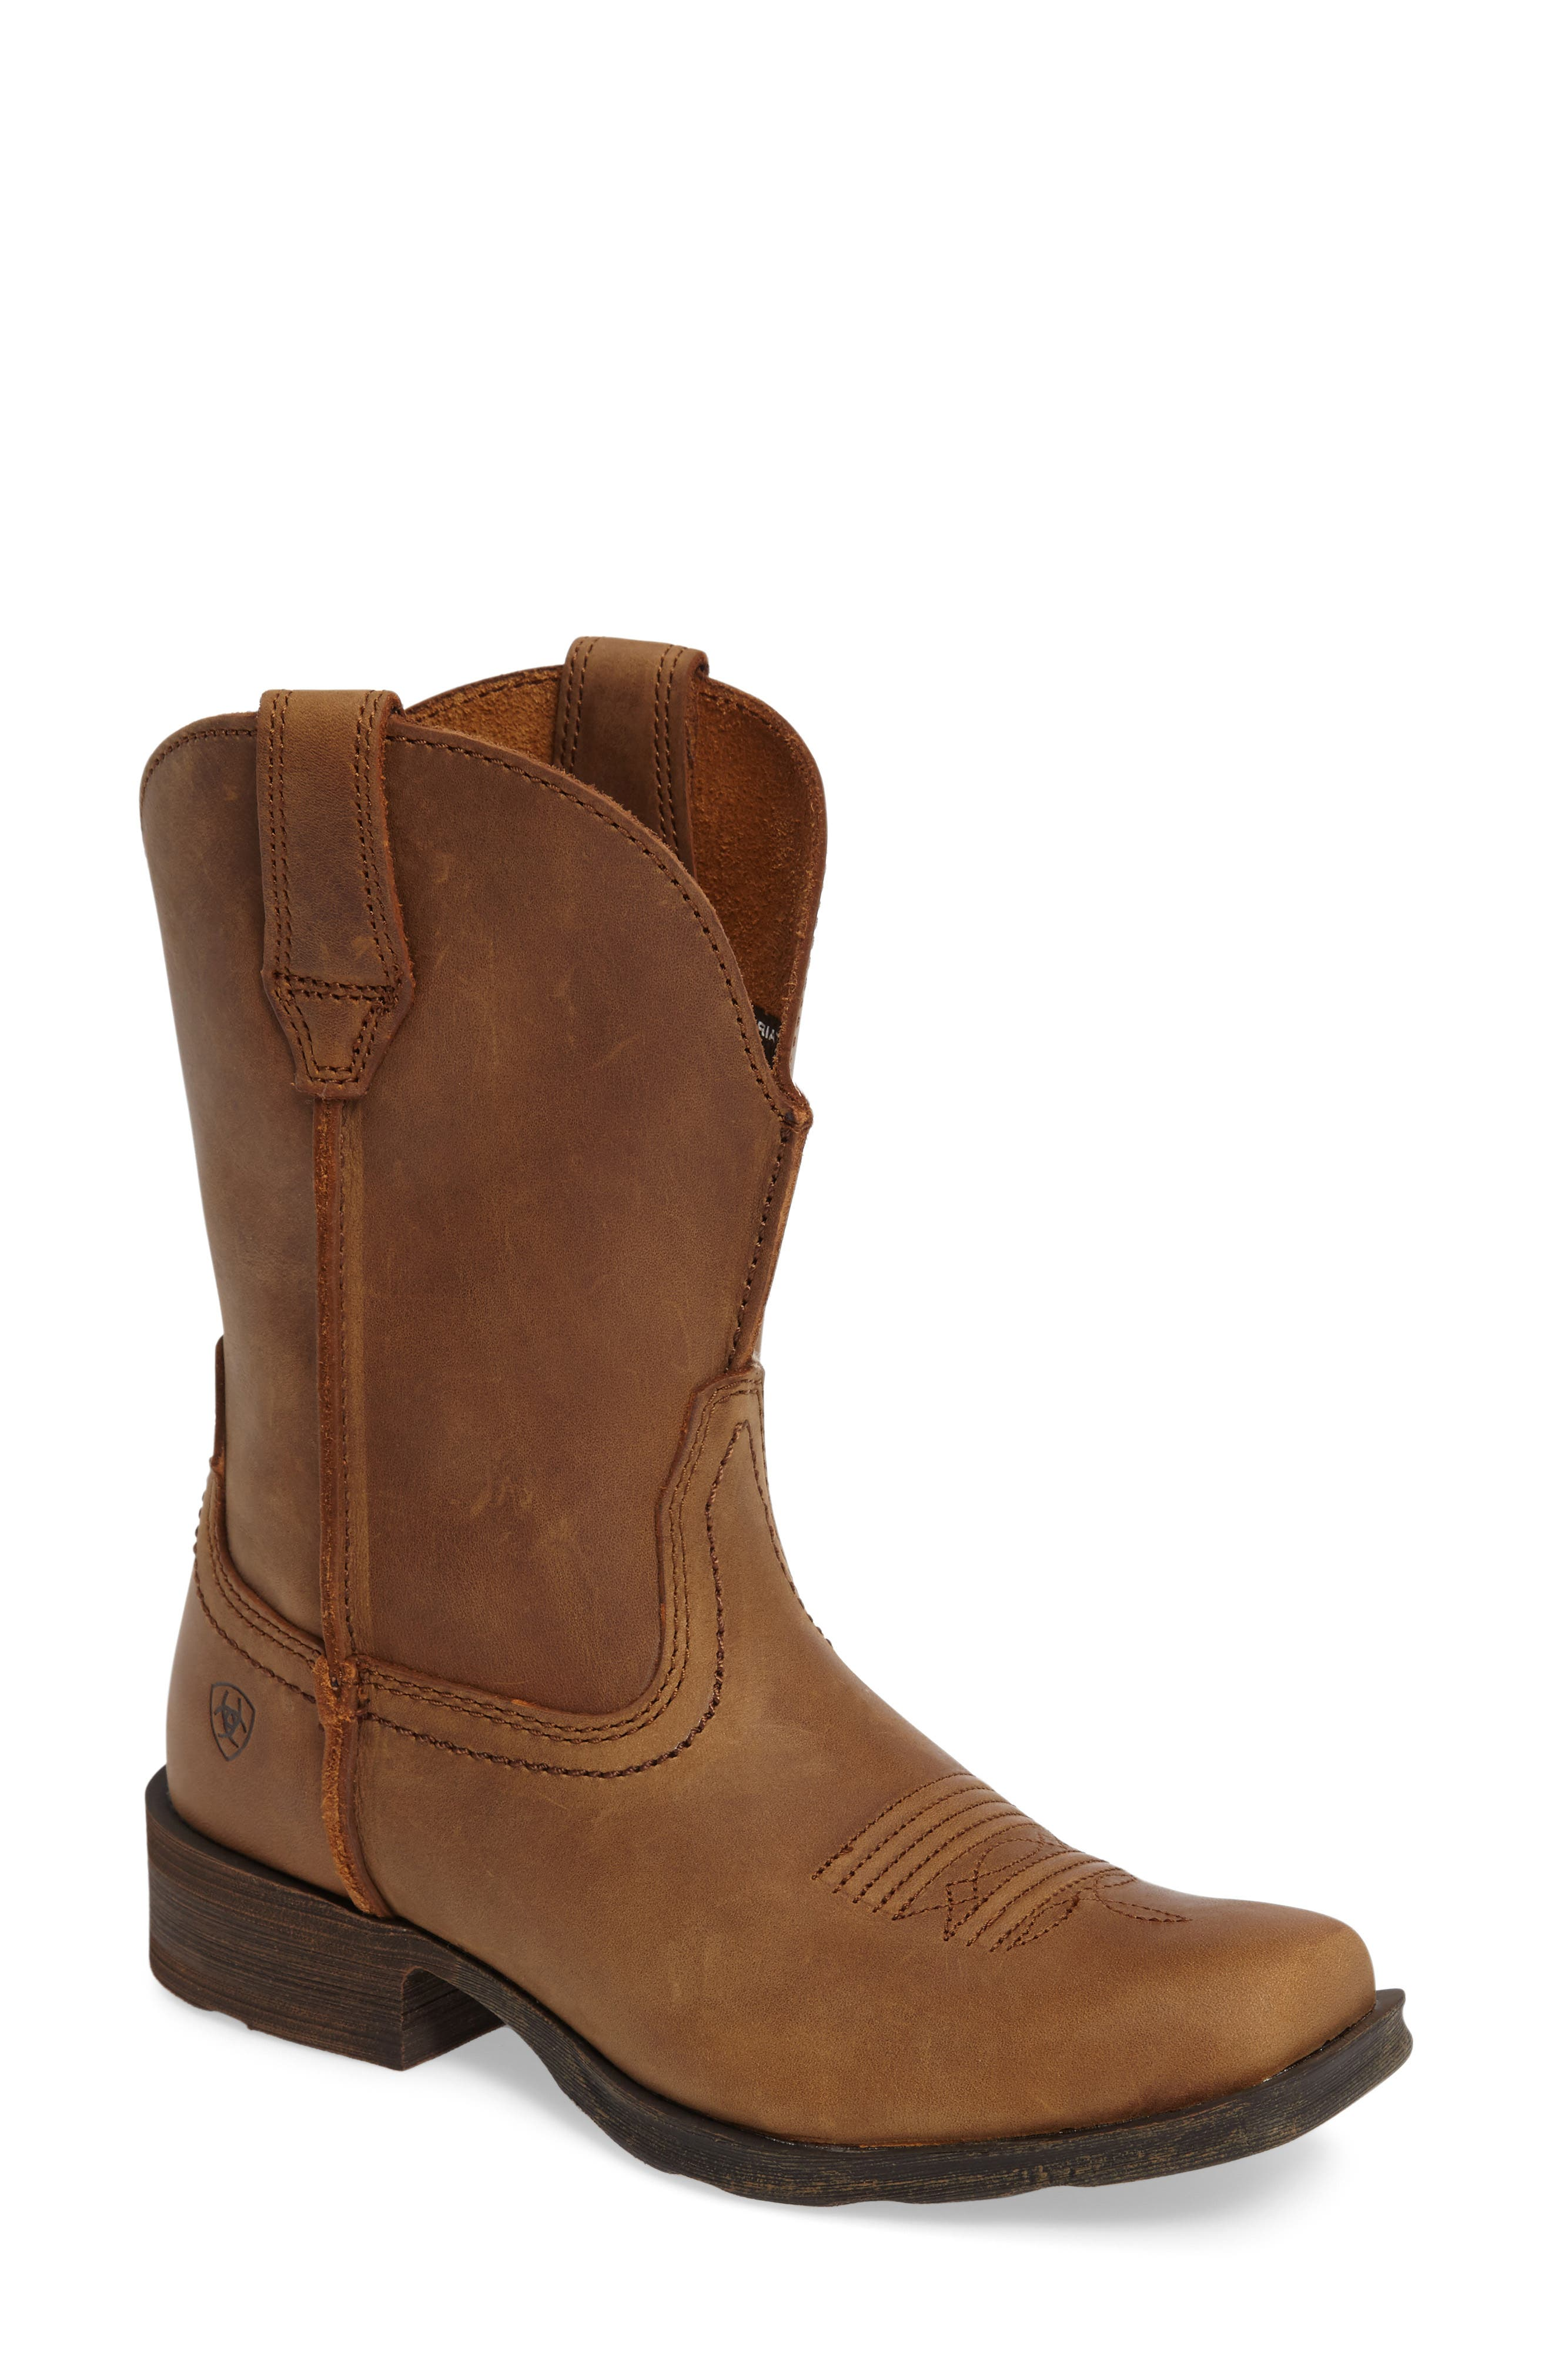 ARIAT Rambler Western Square Toe Boot